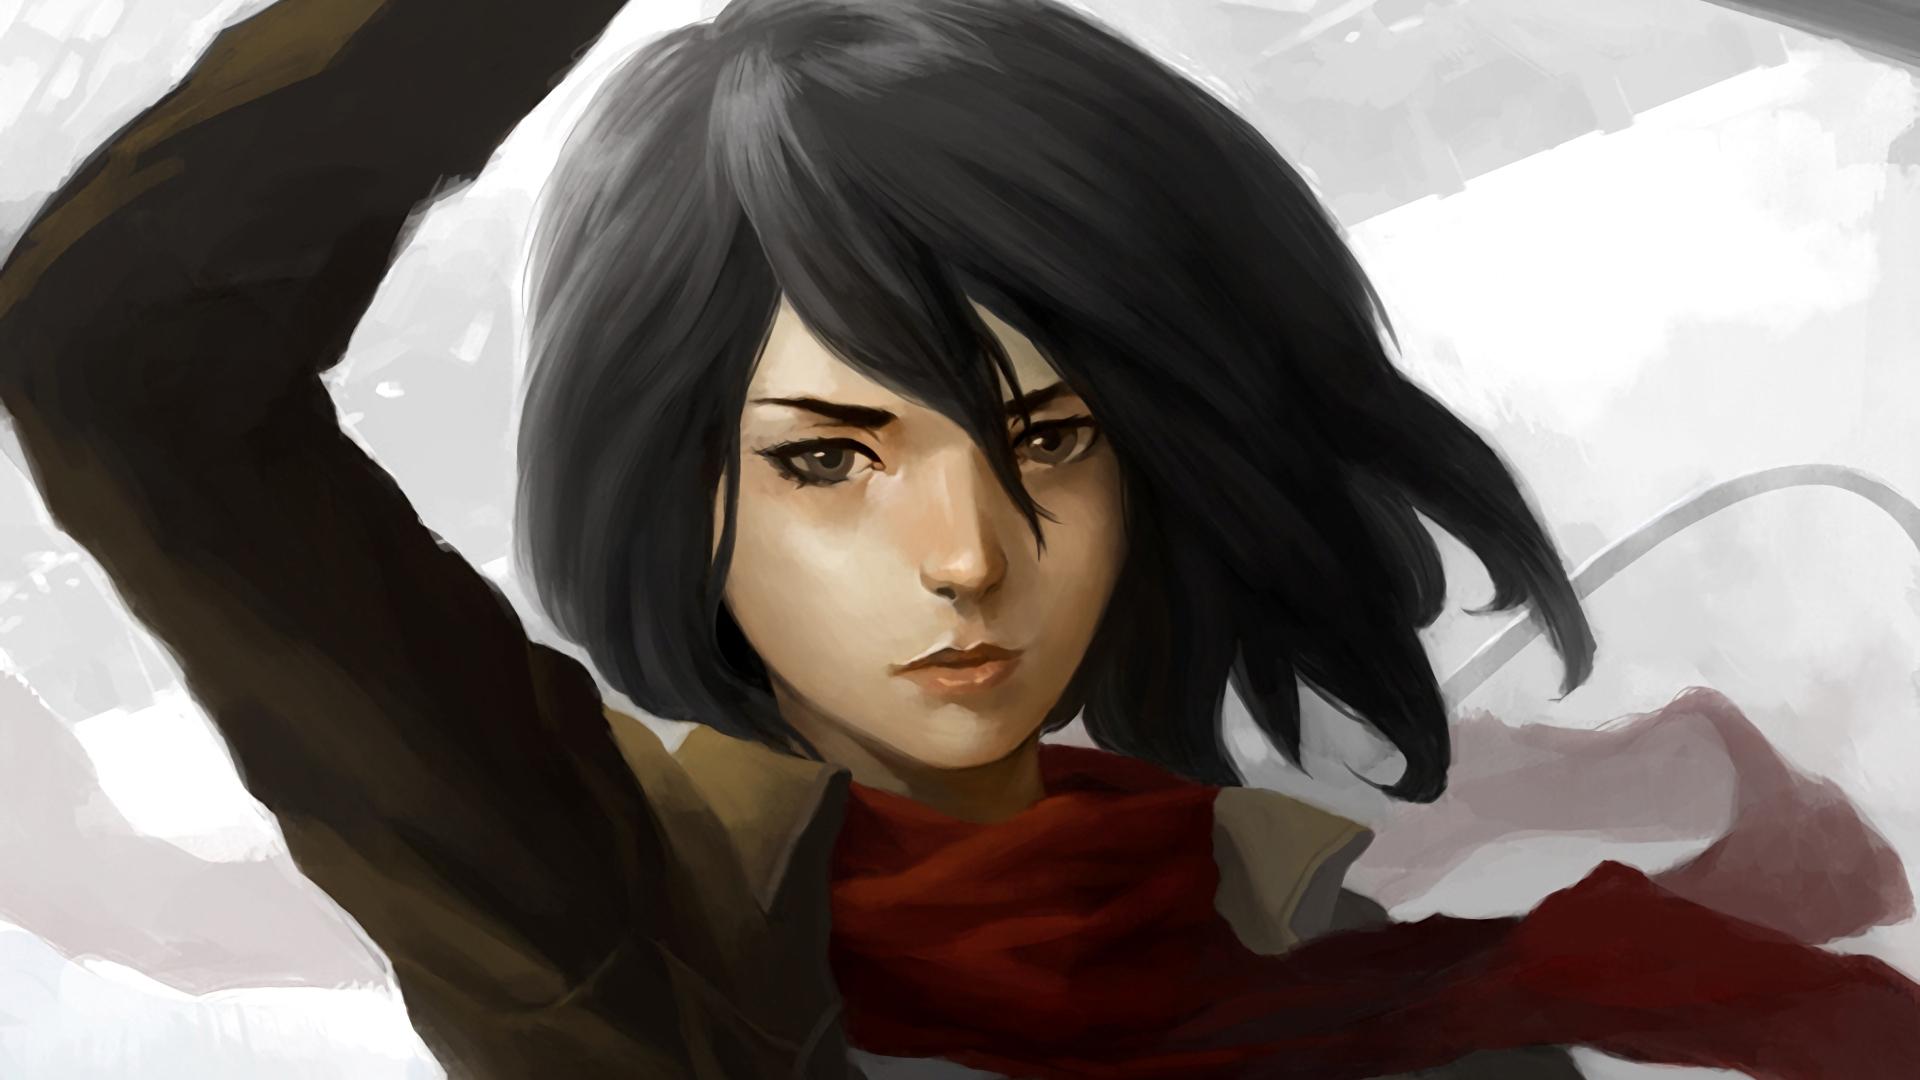 Desktop Wallpaper Mikasa Ackerman Attack On Titan Anime Anime Girl Face Hd Image Picture Background C0vtd9